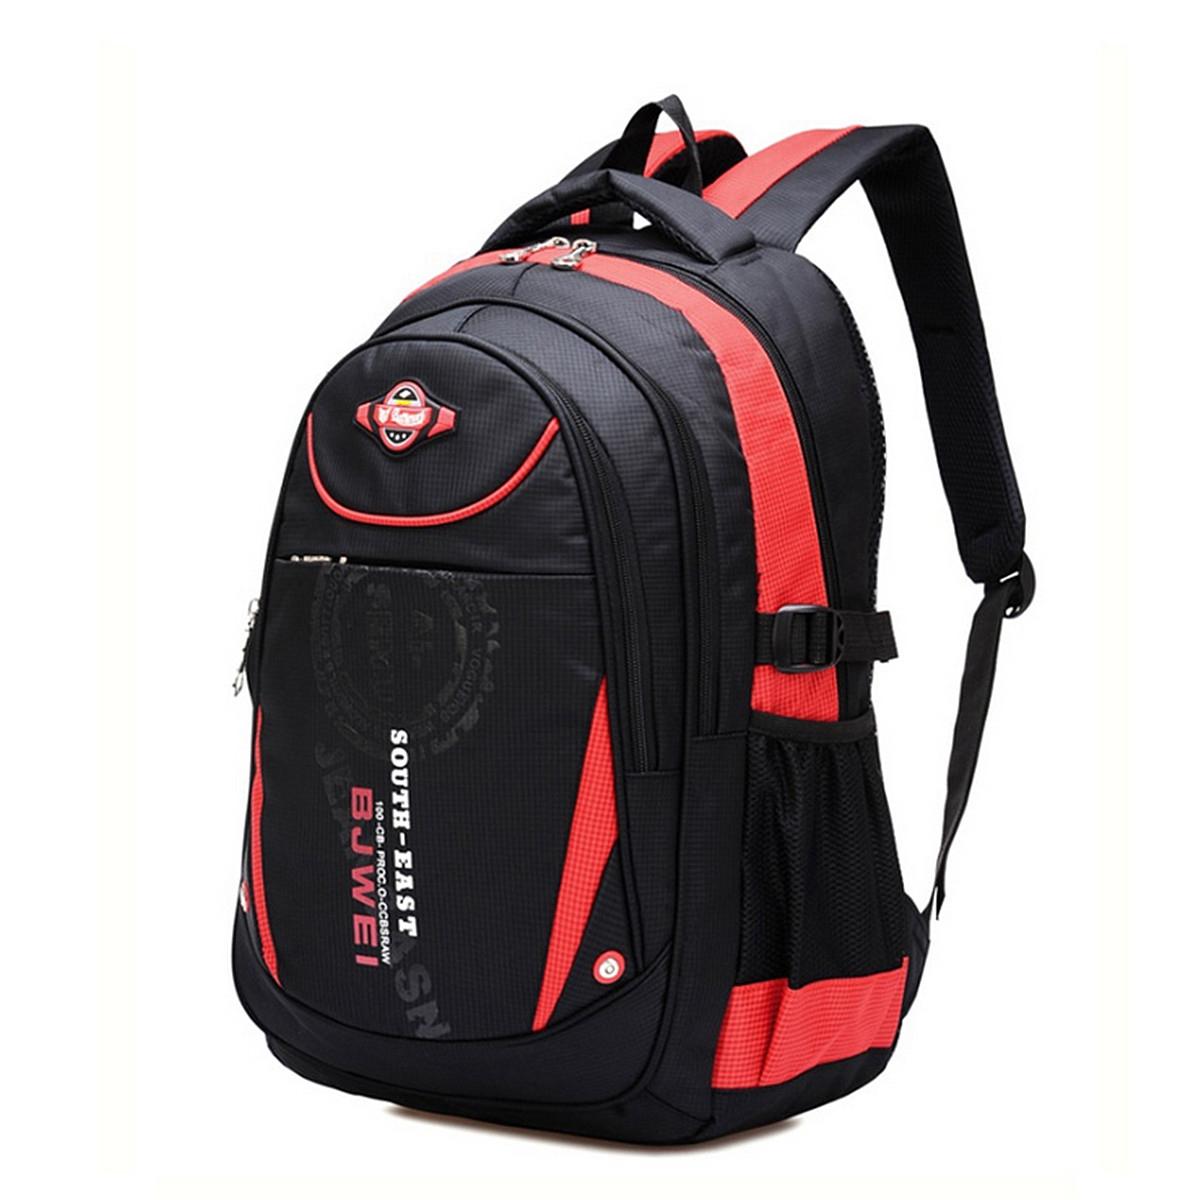 Waterproof Children School Bags Girls Boys Travel Backpack Shoulder Bag Rucksack